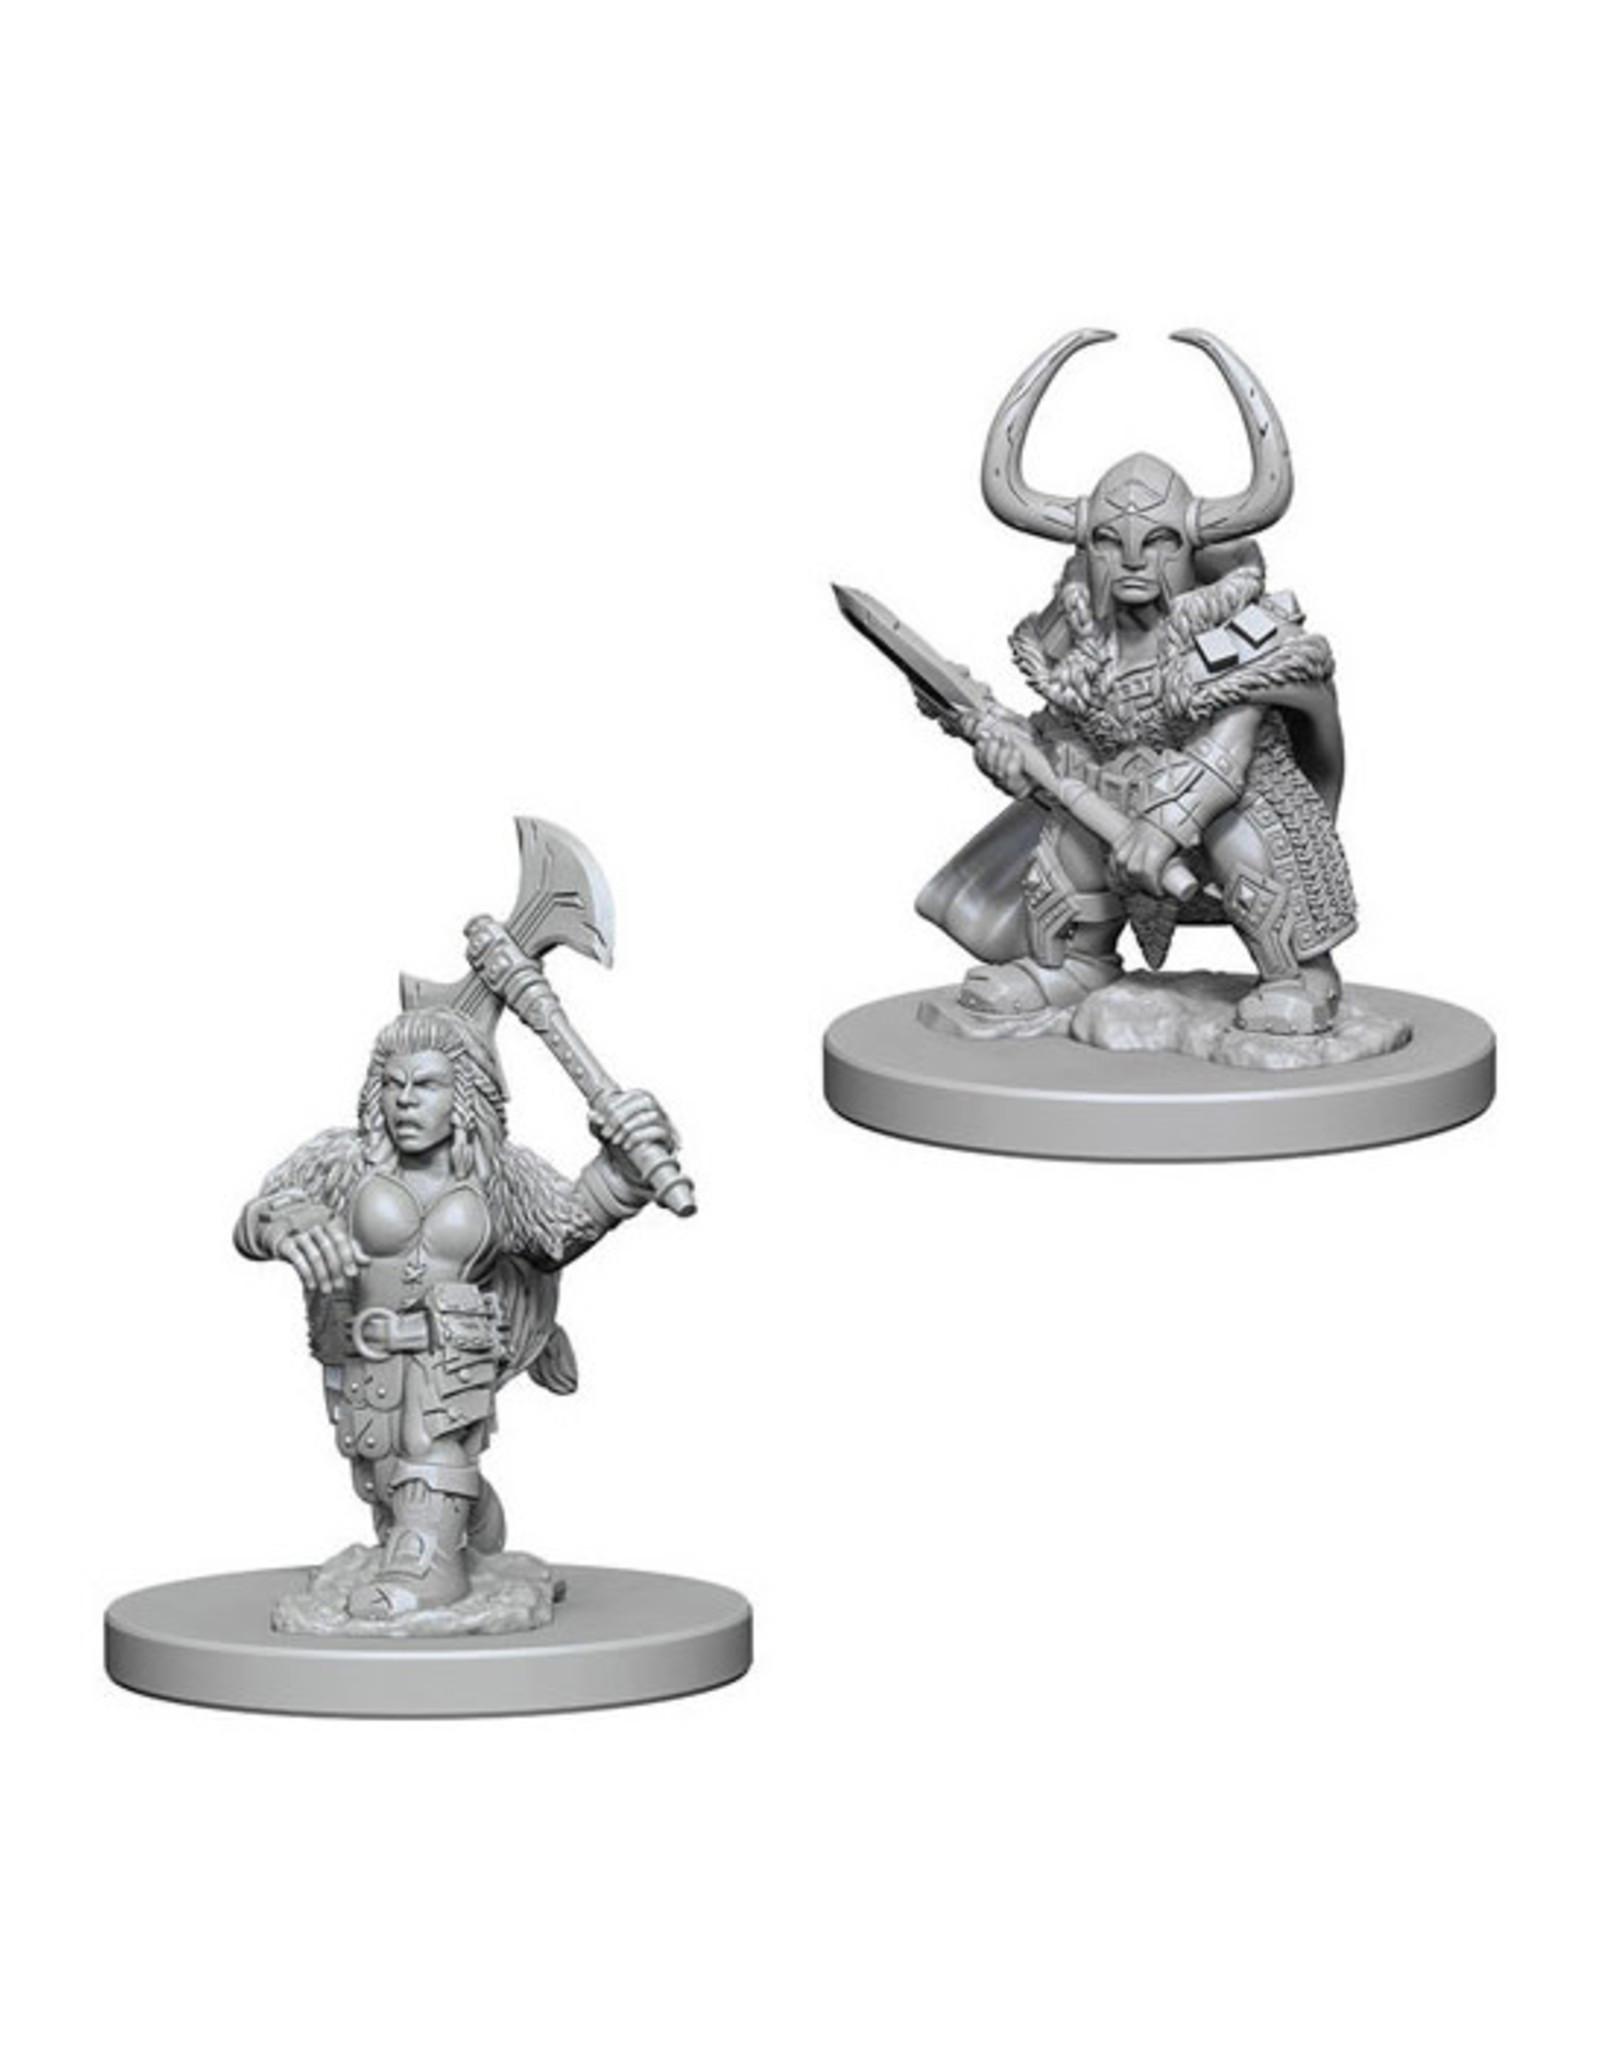 Dungeons & Dragons Dungeons & Dragons: Nolzur's - Dwarf Female Barbarian